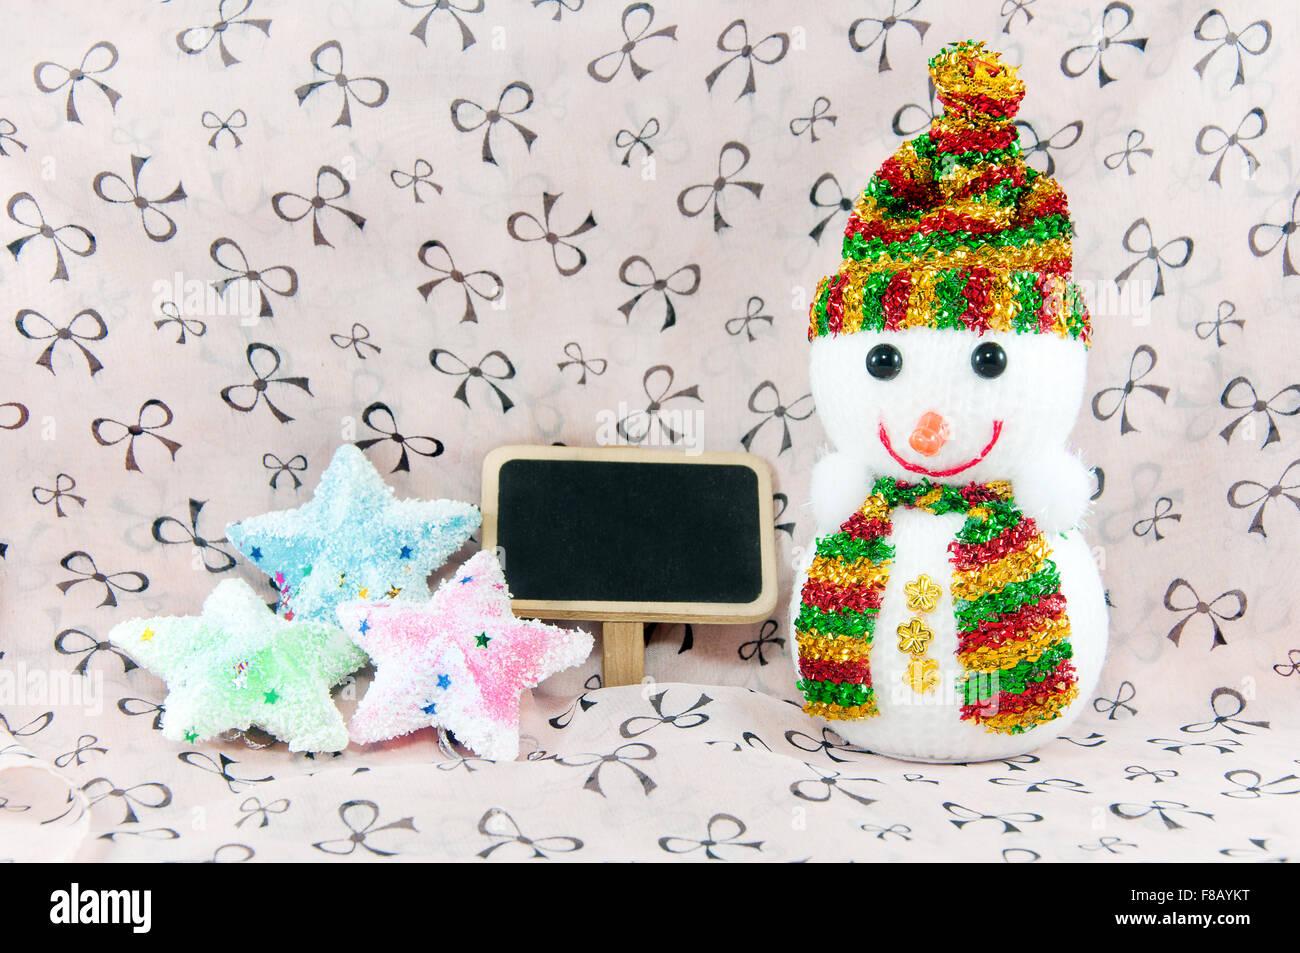 Snowman on x-mas - Stock Image